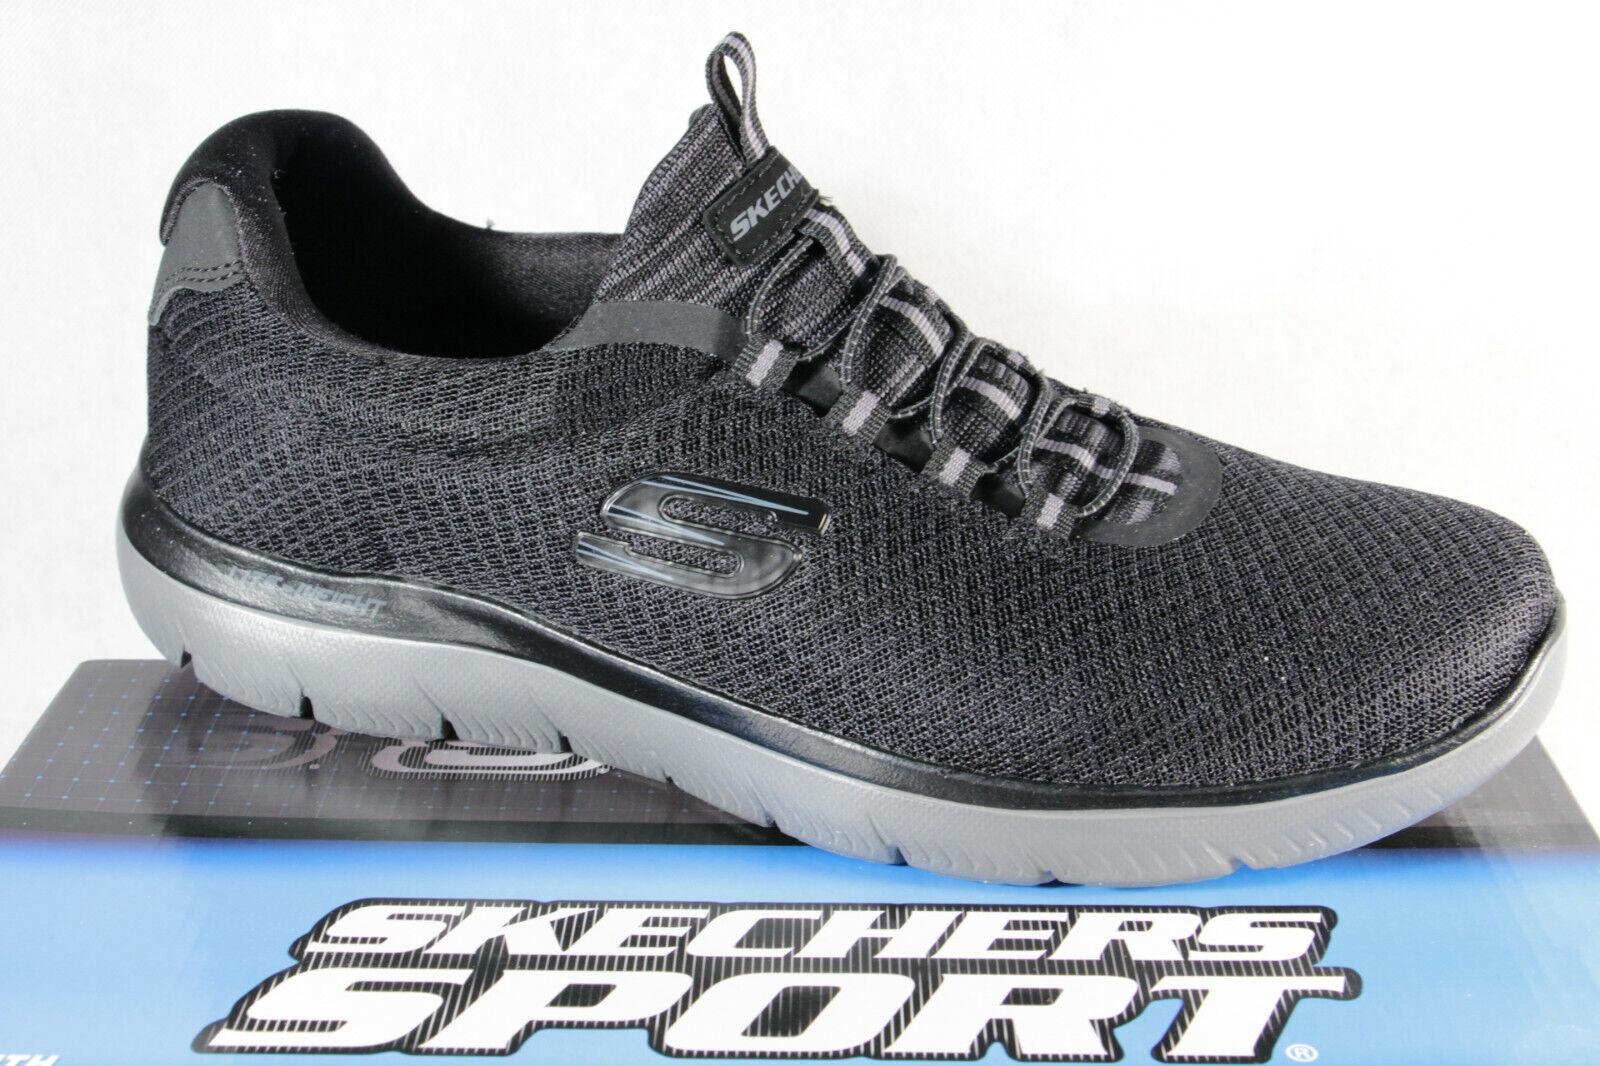 Skechers Herren Slipper Sneakers Sneaker Sportschuhe Halbschuhe schwarz NEU!